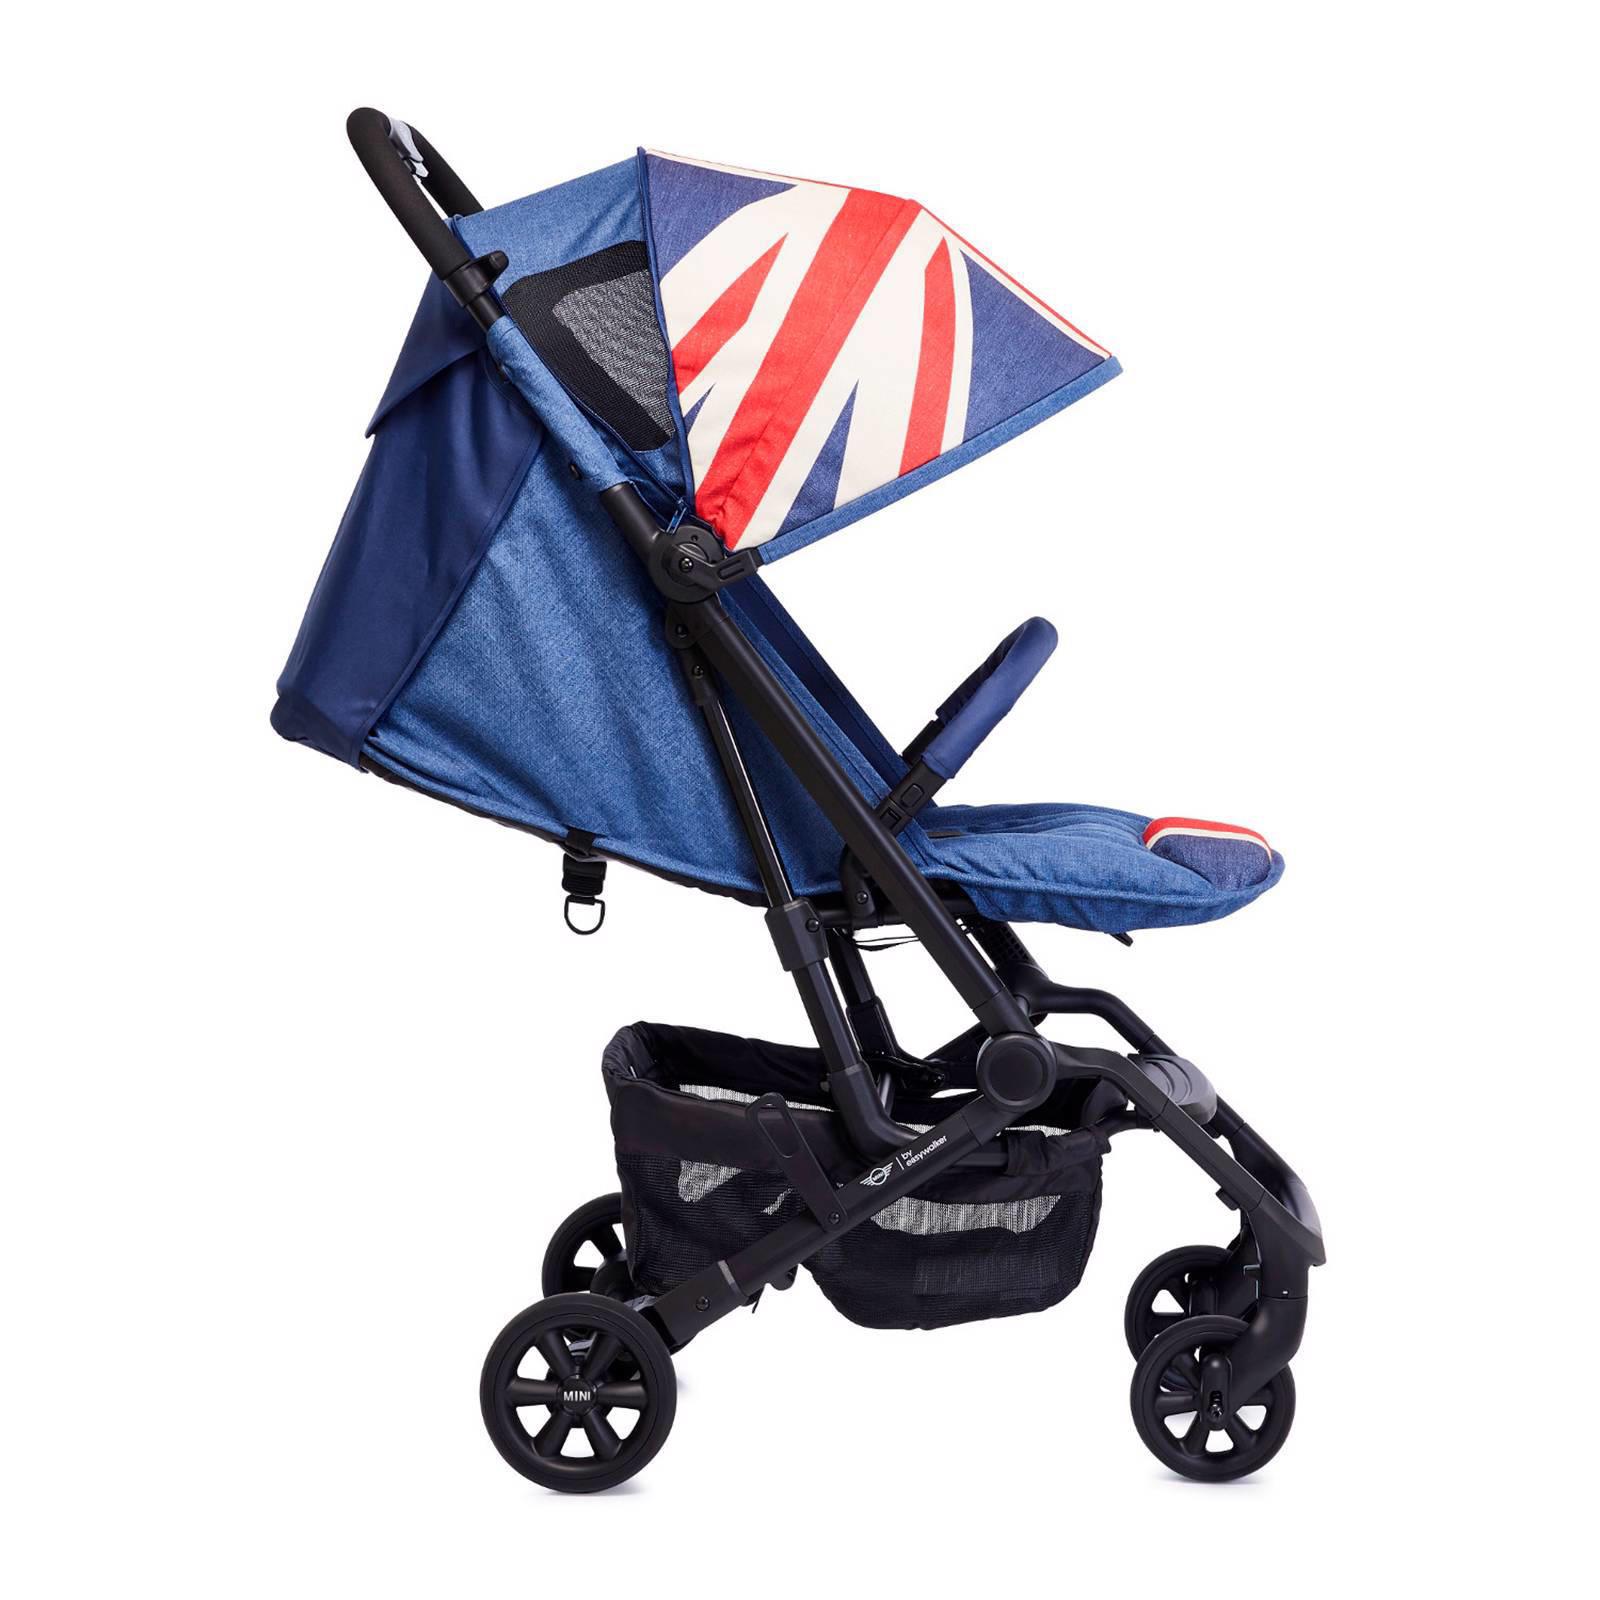 Easywalker Mini by Easywalker XS Buggy Union Jack Vintage én parasol én voetenzak én transporttas én cupholder